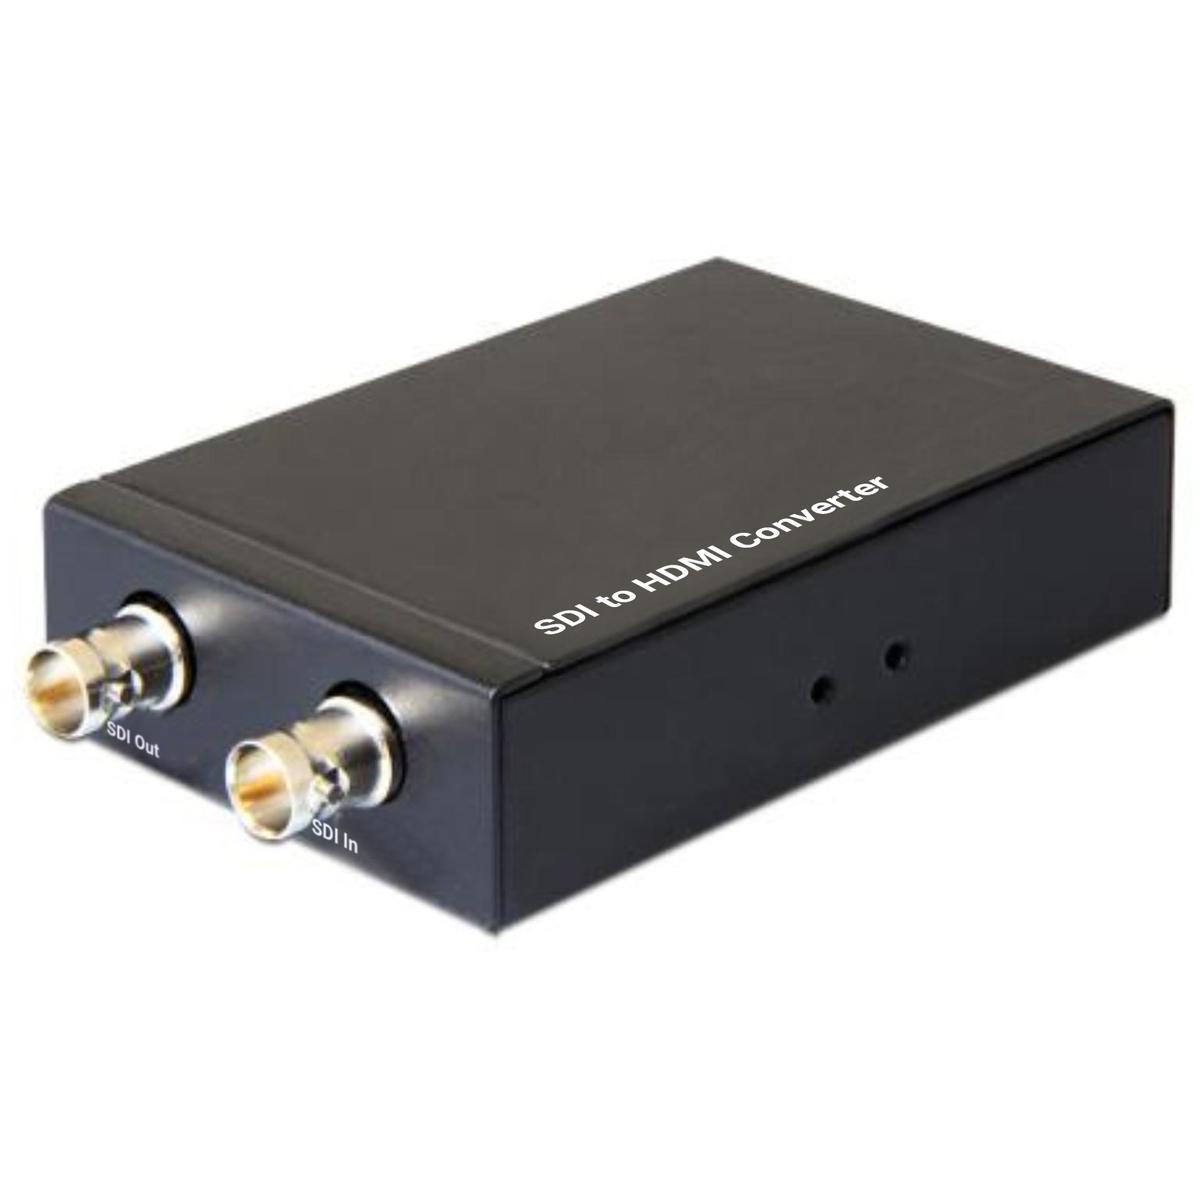 SDI naar HDMI omvormer SDI compatibel: SD-SDI, HD-SDI en 3G-SDI